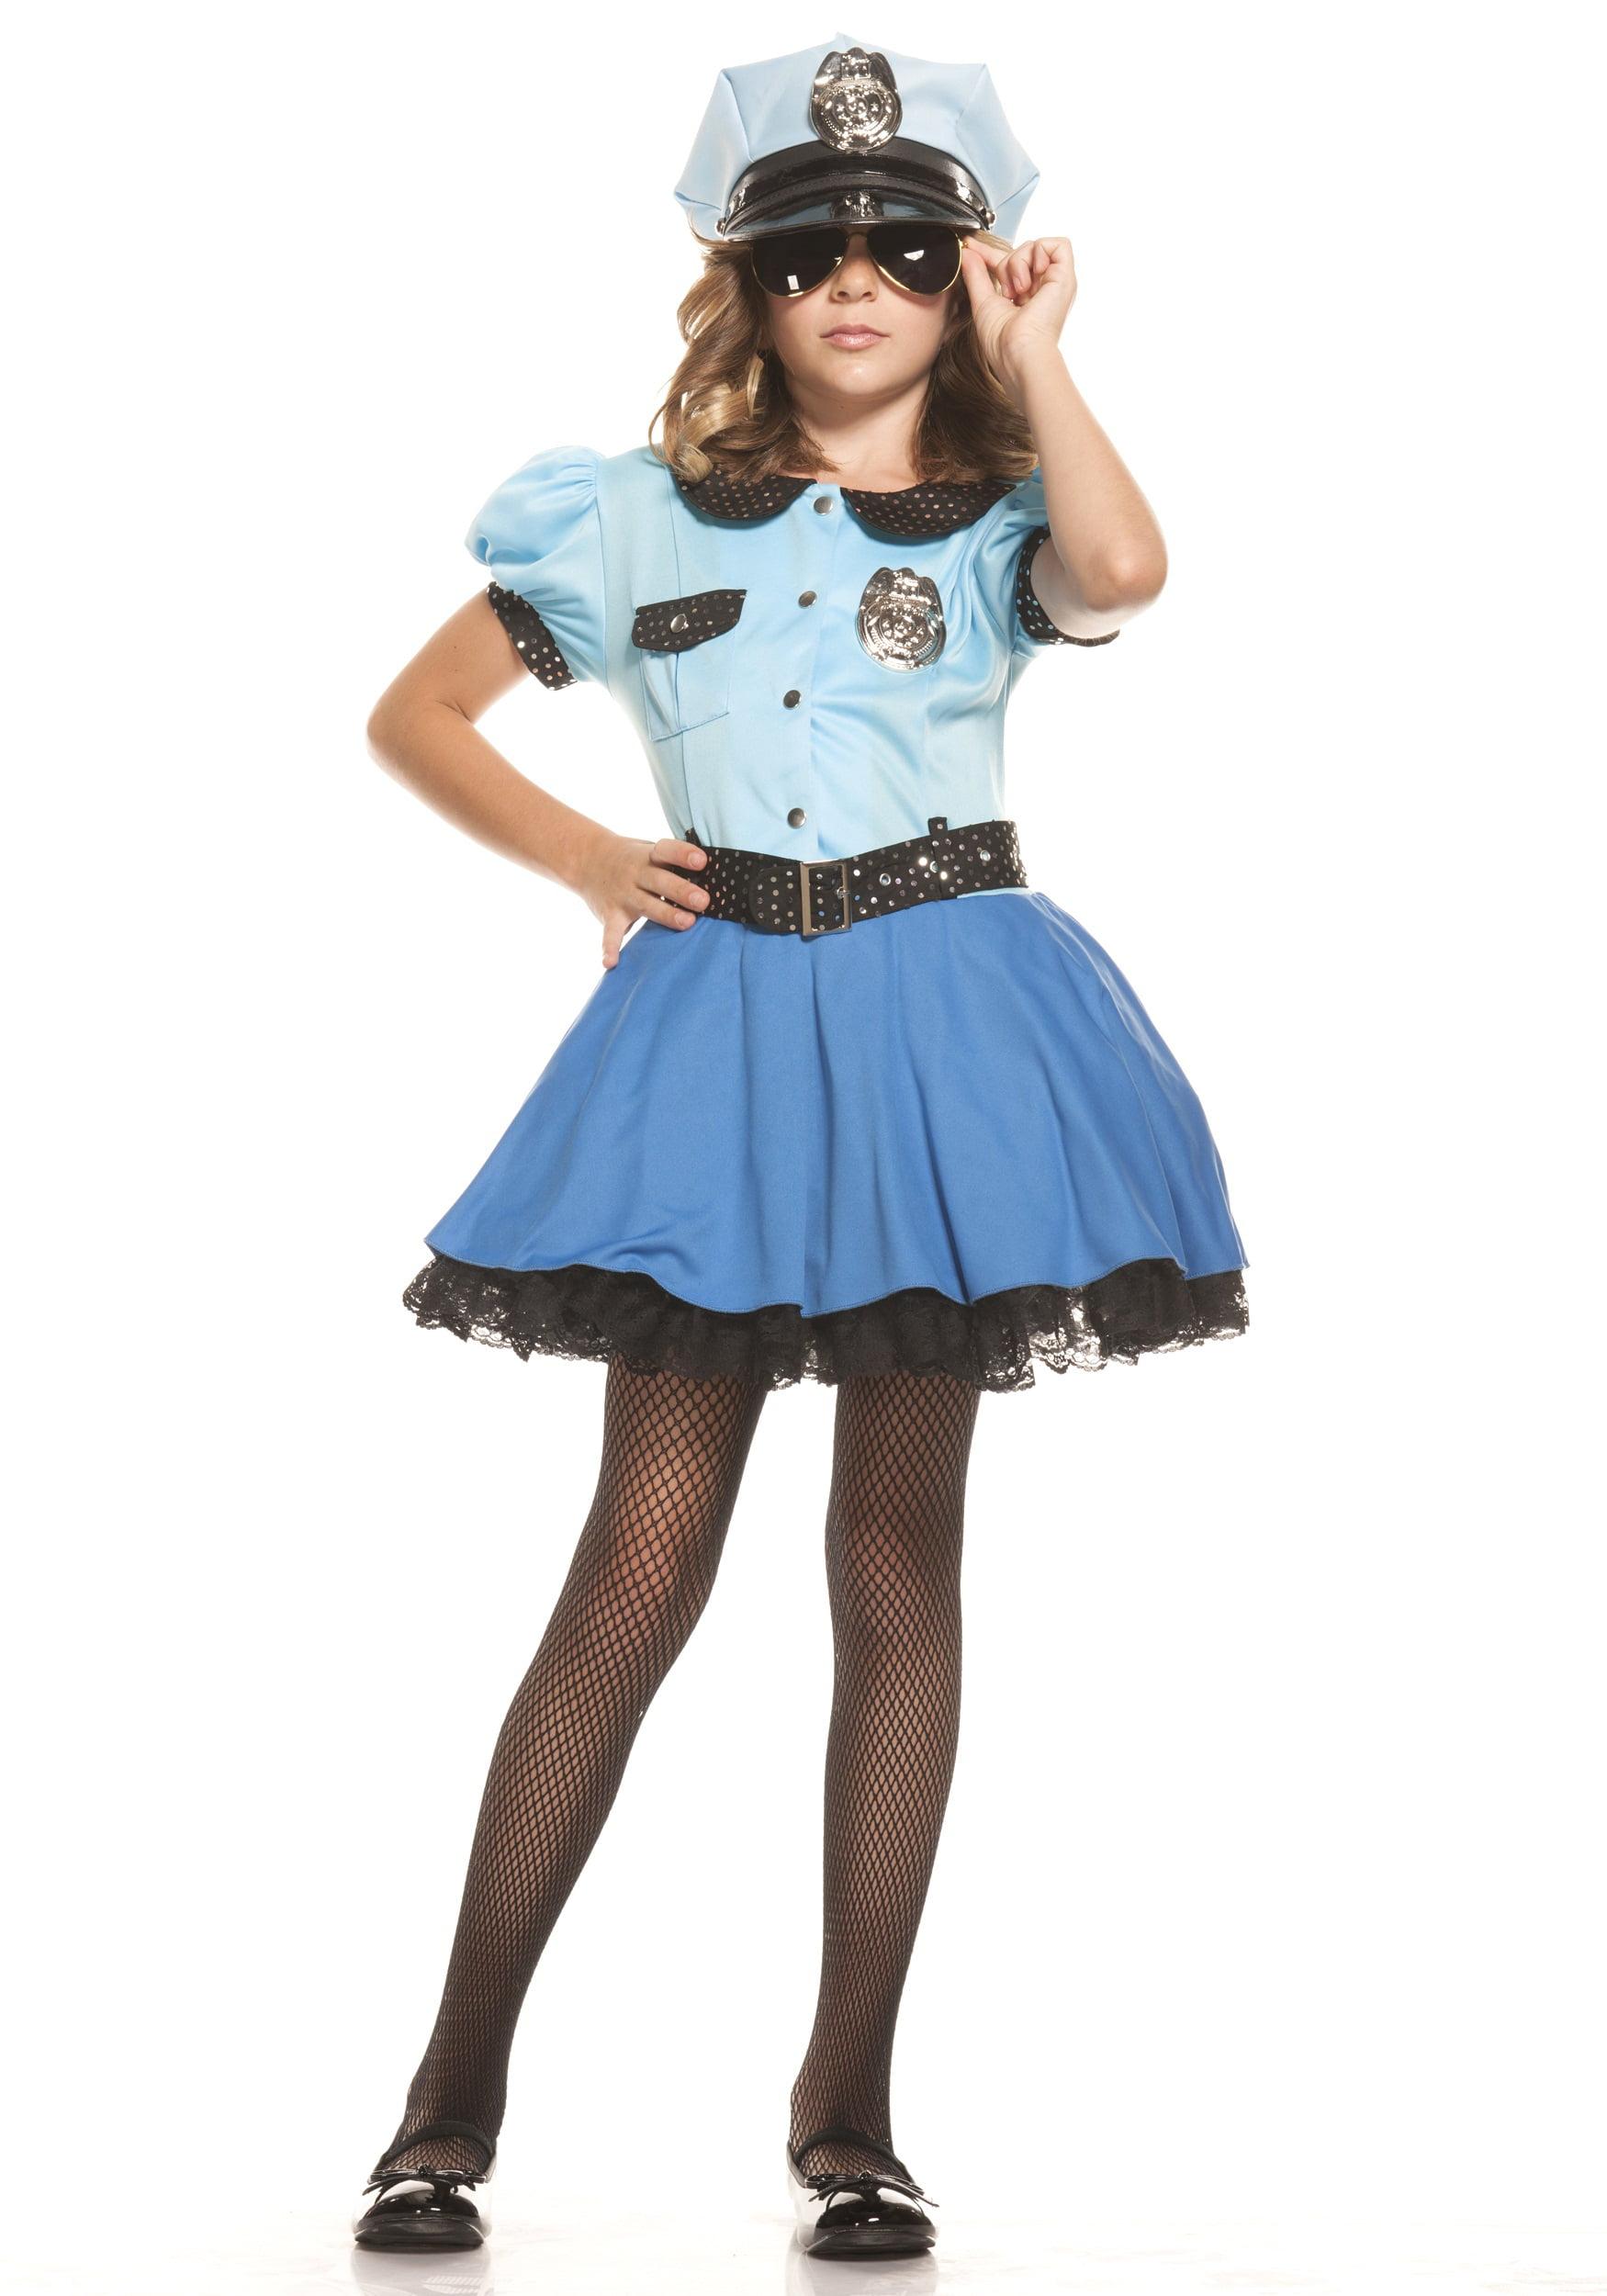 Girls Police Uniform Costume by